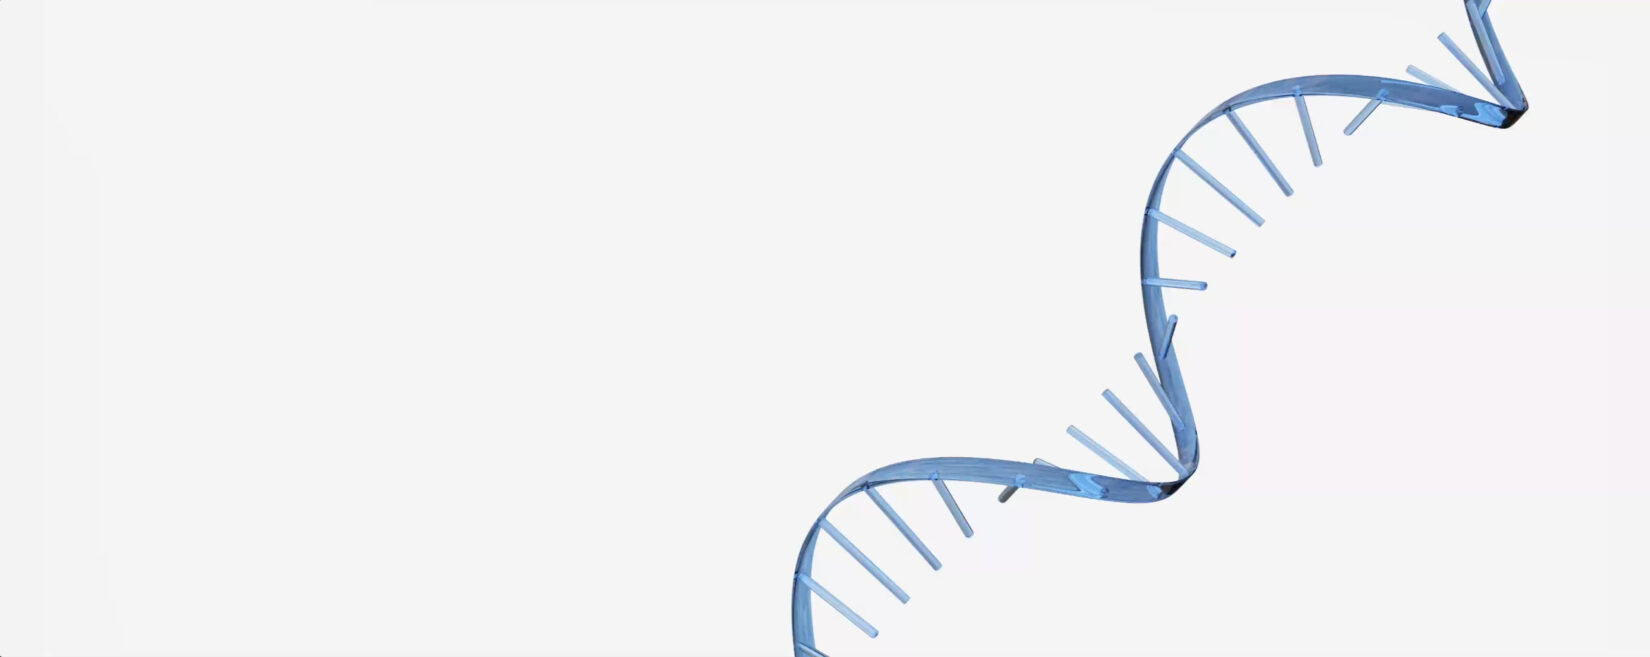 RNA strand against a white background